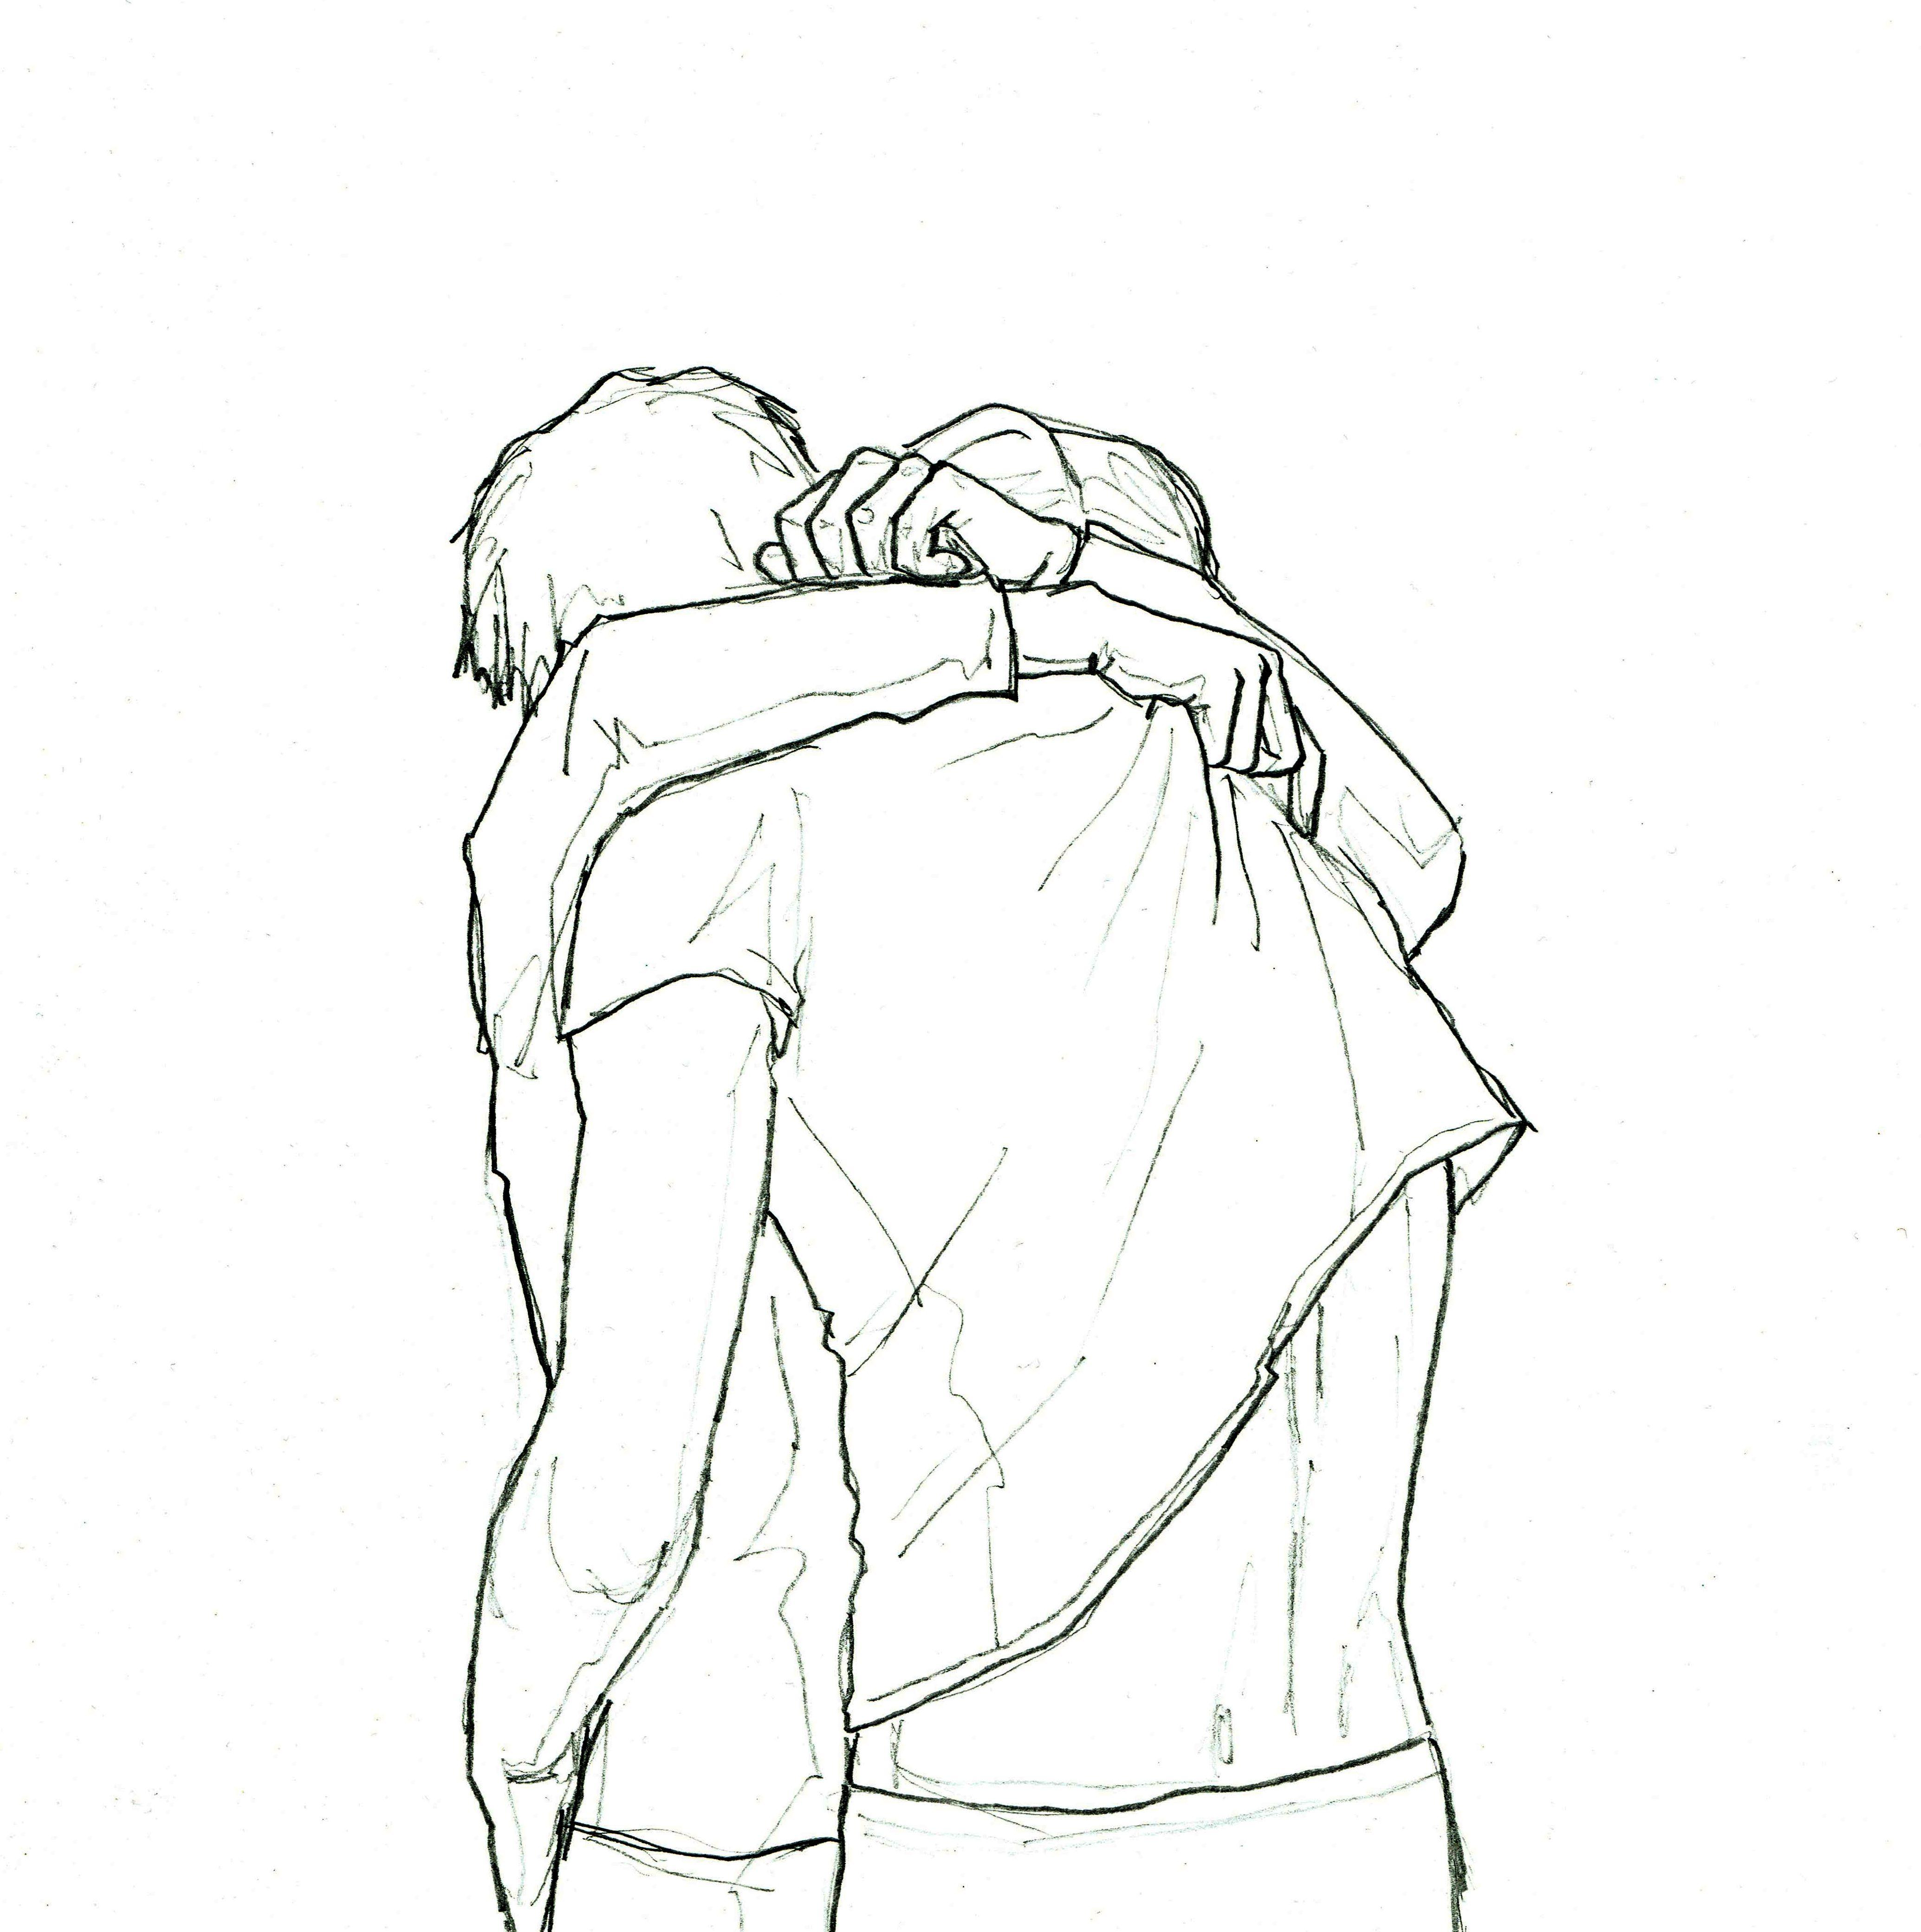 Hug Sketch By Anastasia Chernyavska Anastasiachernyavska Drawing Illustration Contemporaryart Bea Romantic Drawing Cute Couple Drawings Kiss Illustration